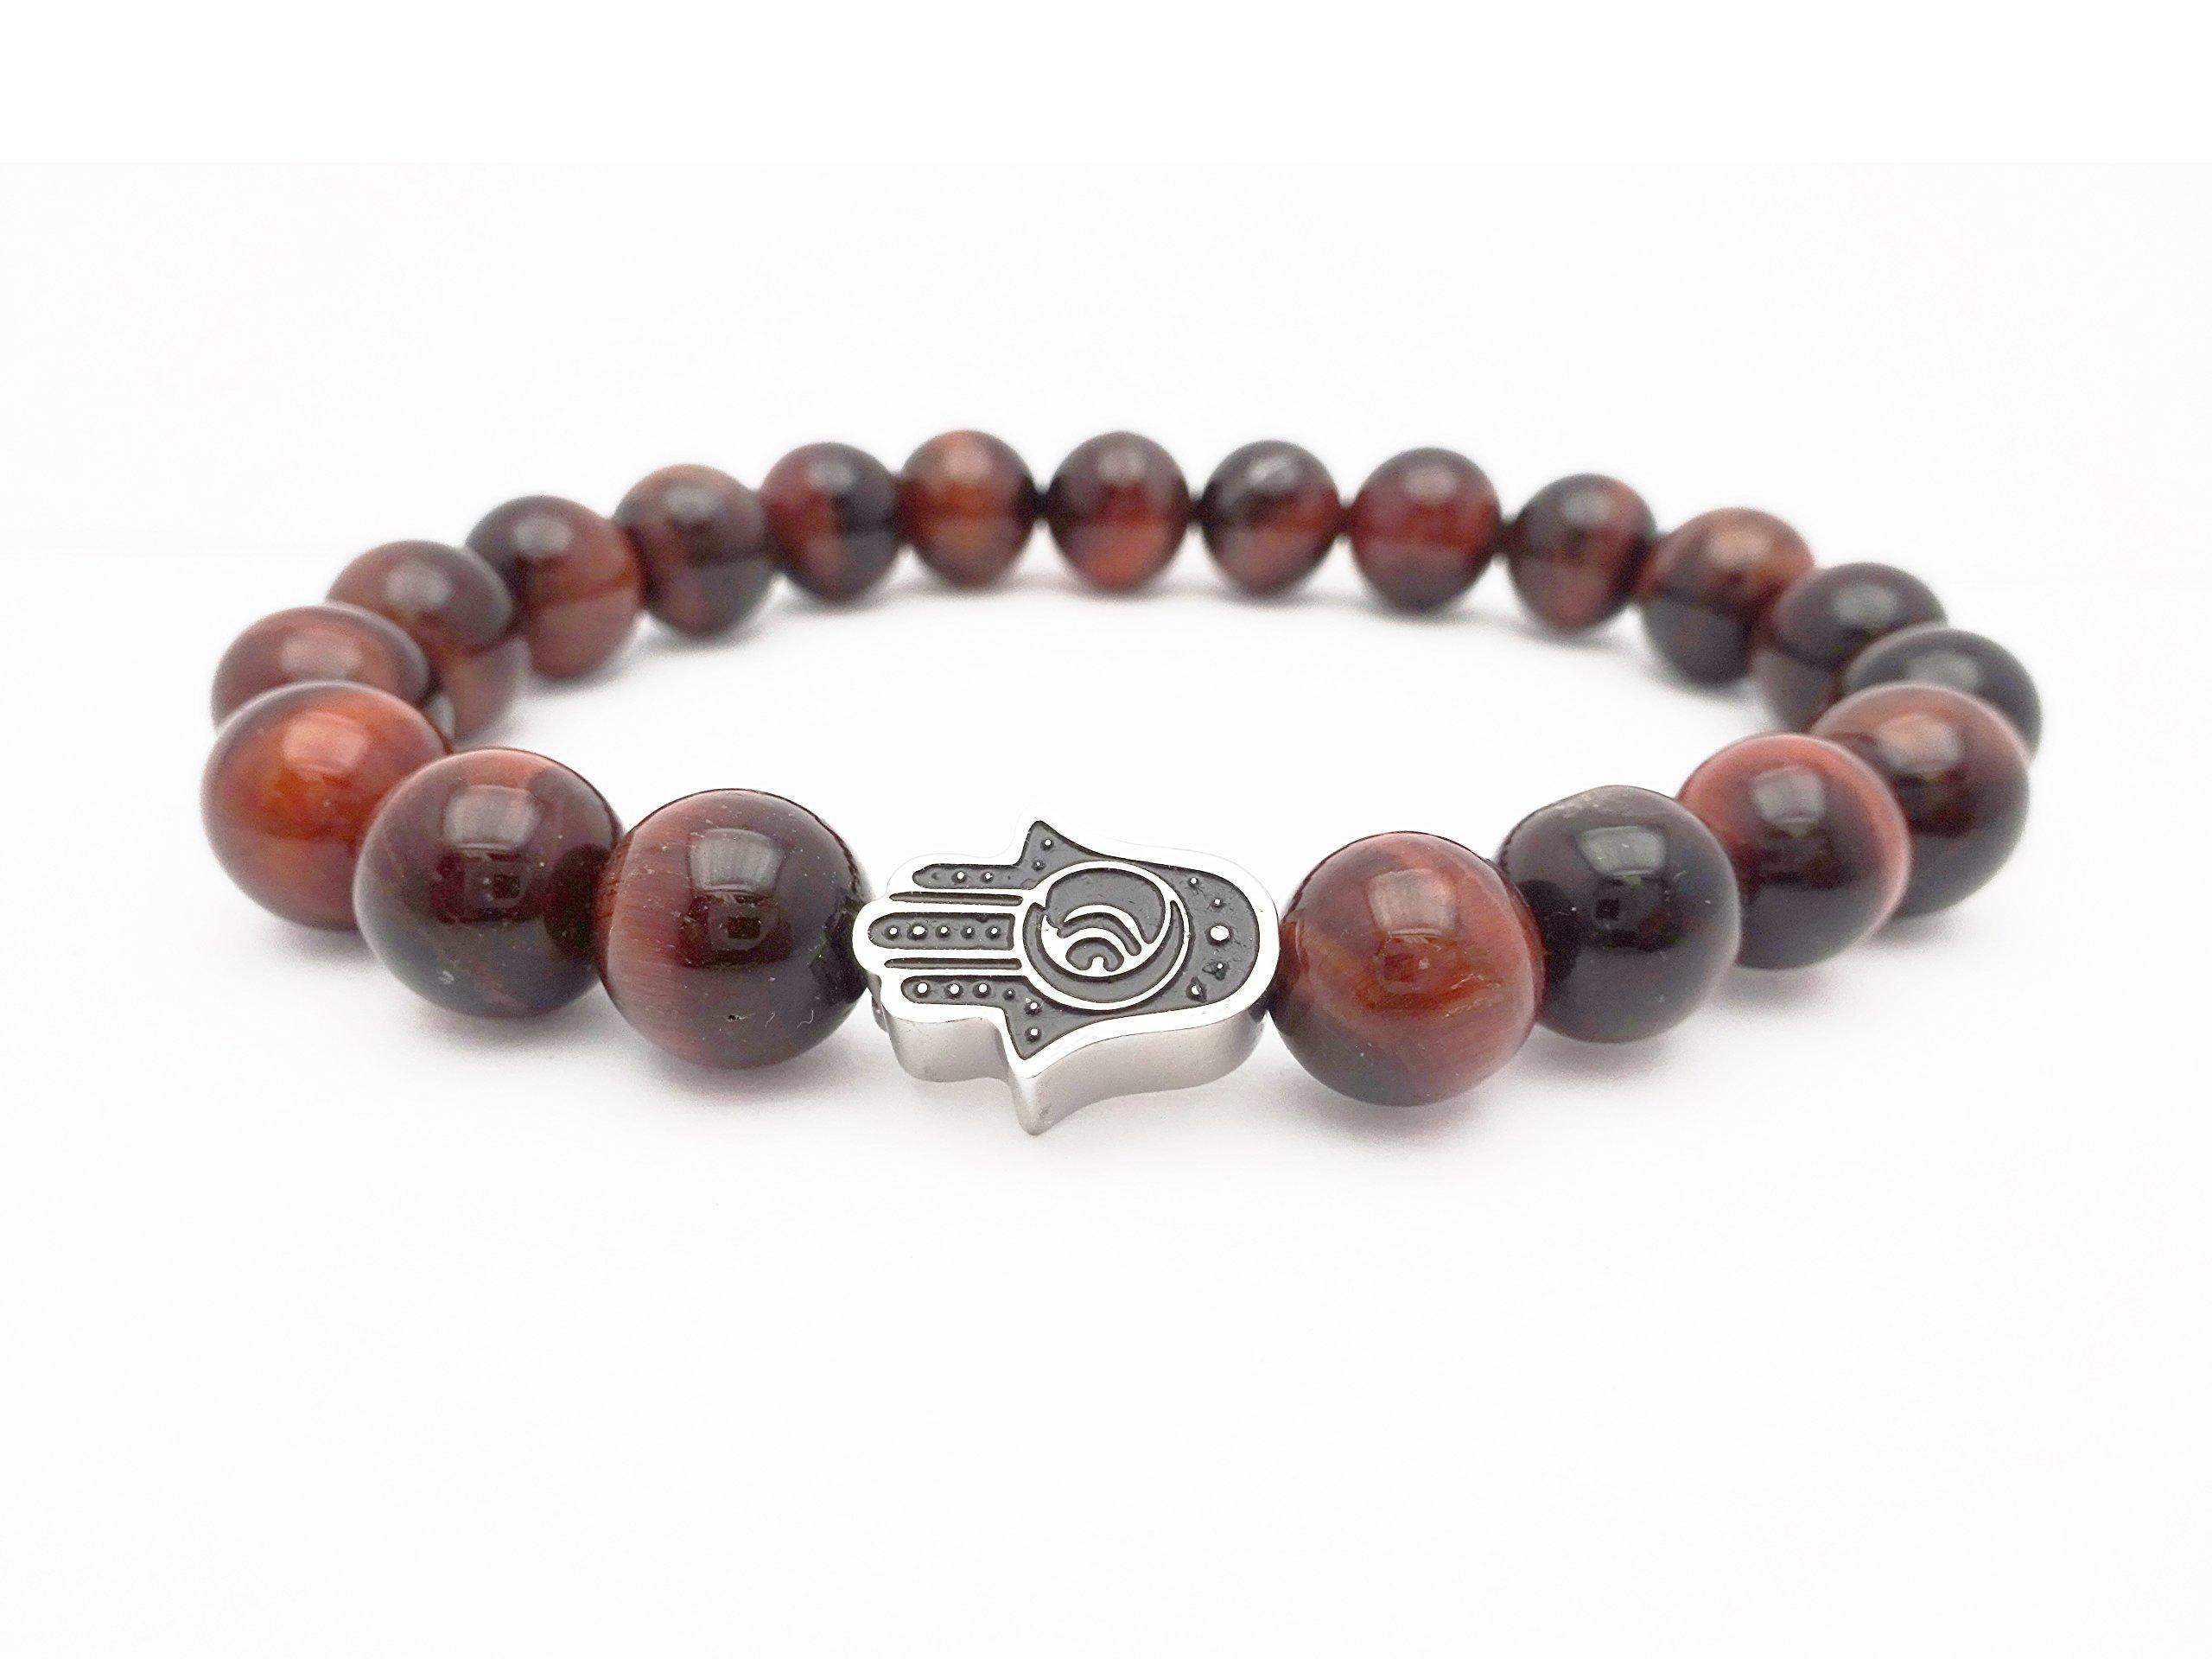 Eye of the Tiger Reddish-Brown Bead Bracelet with Hamsa